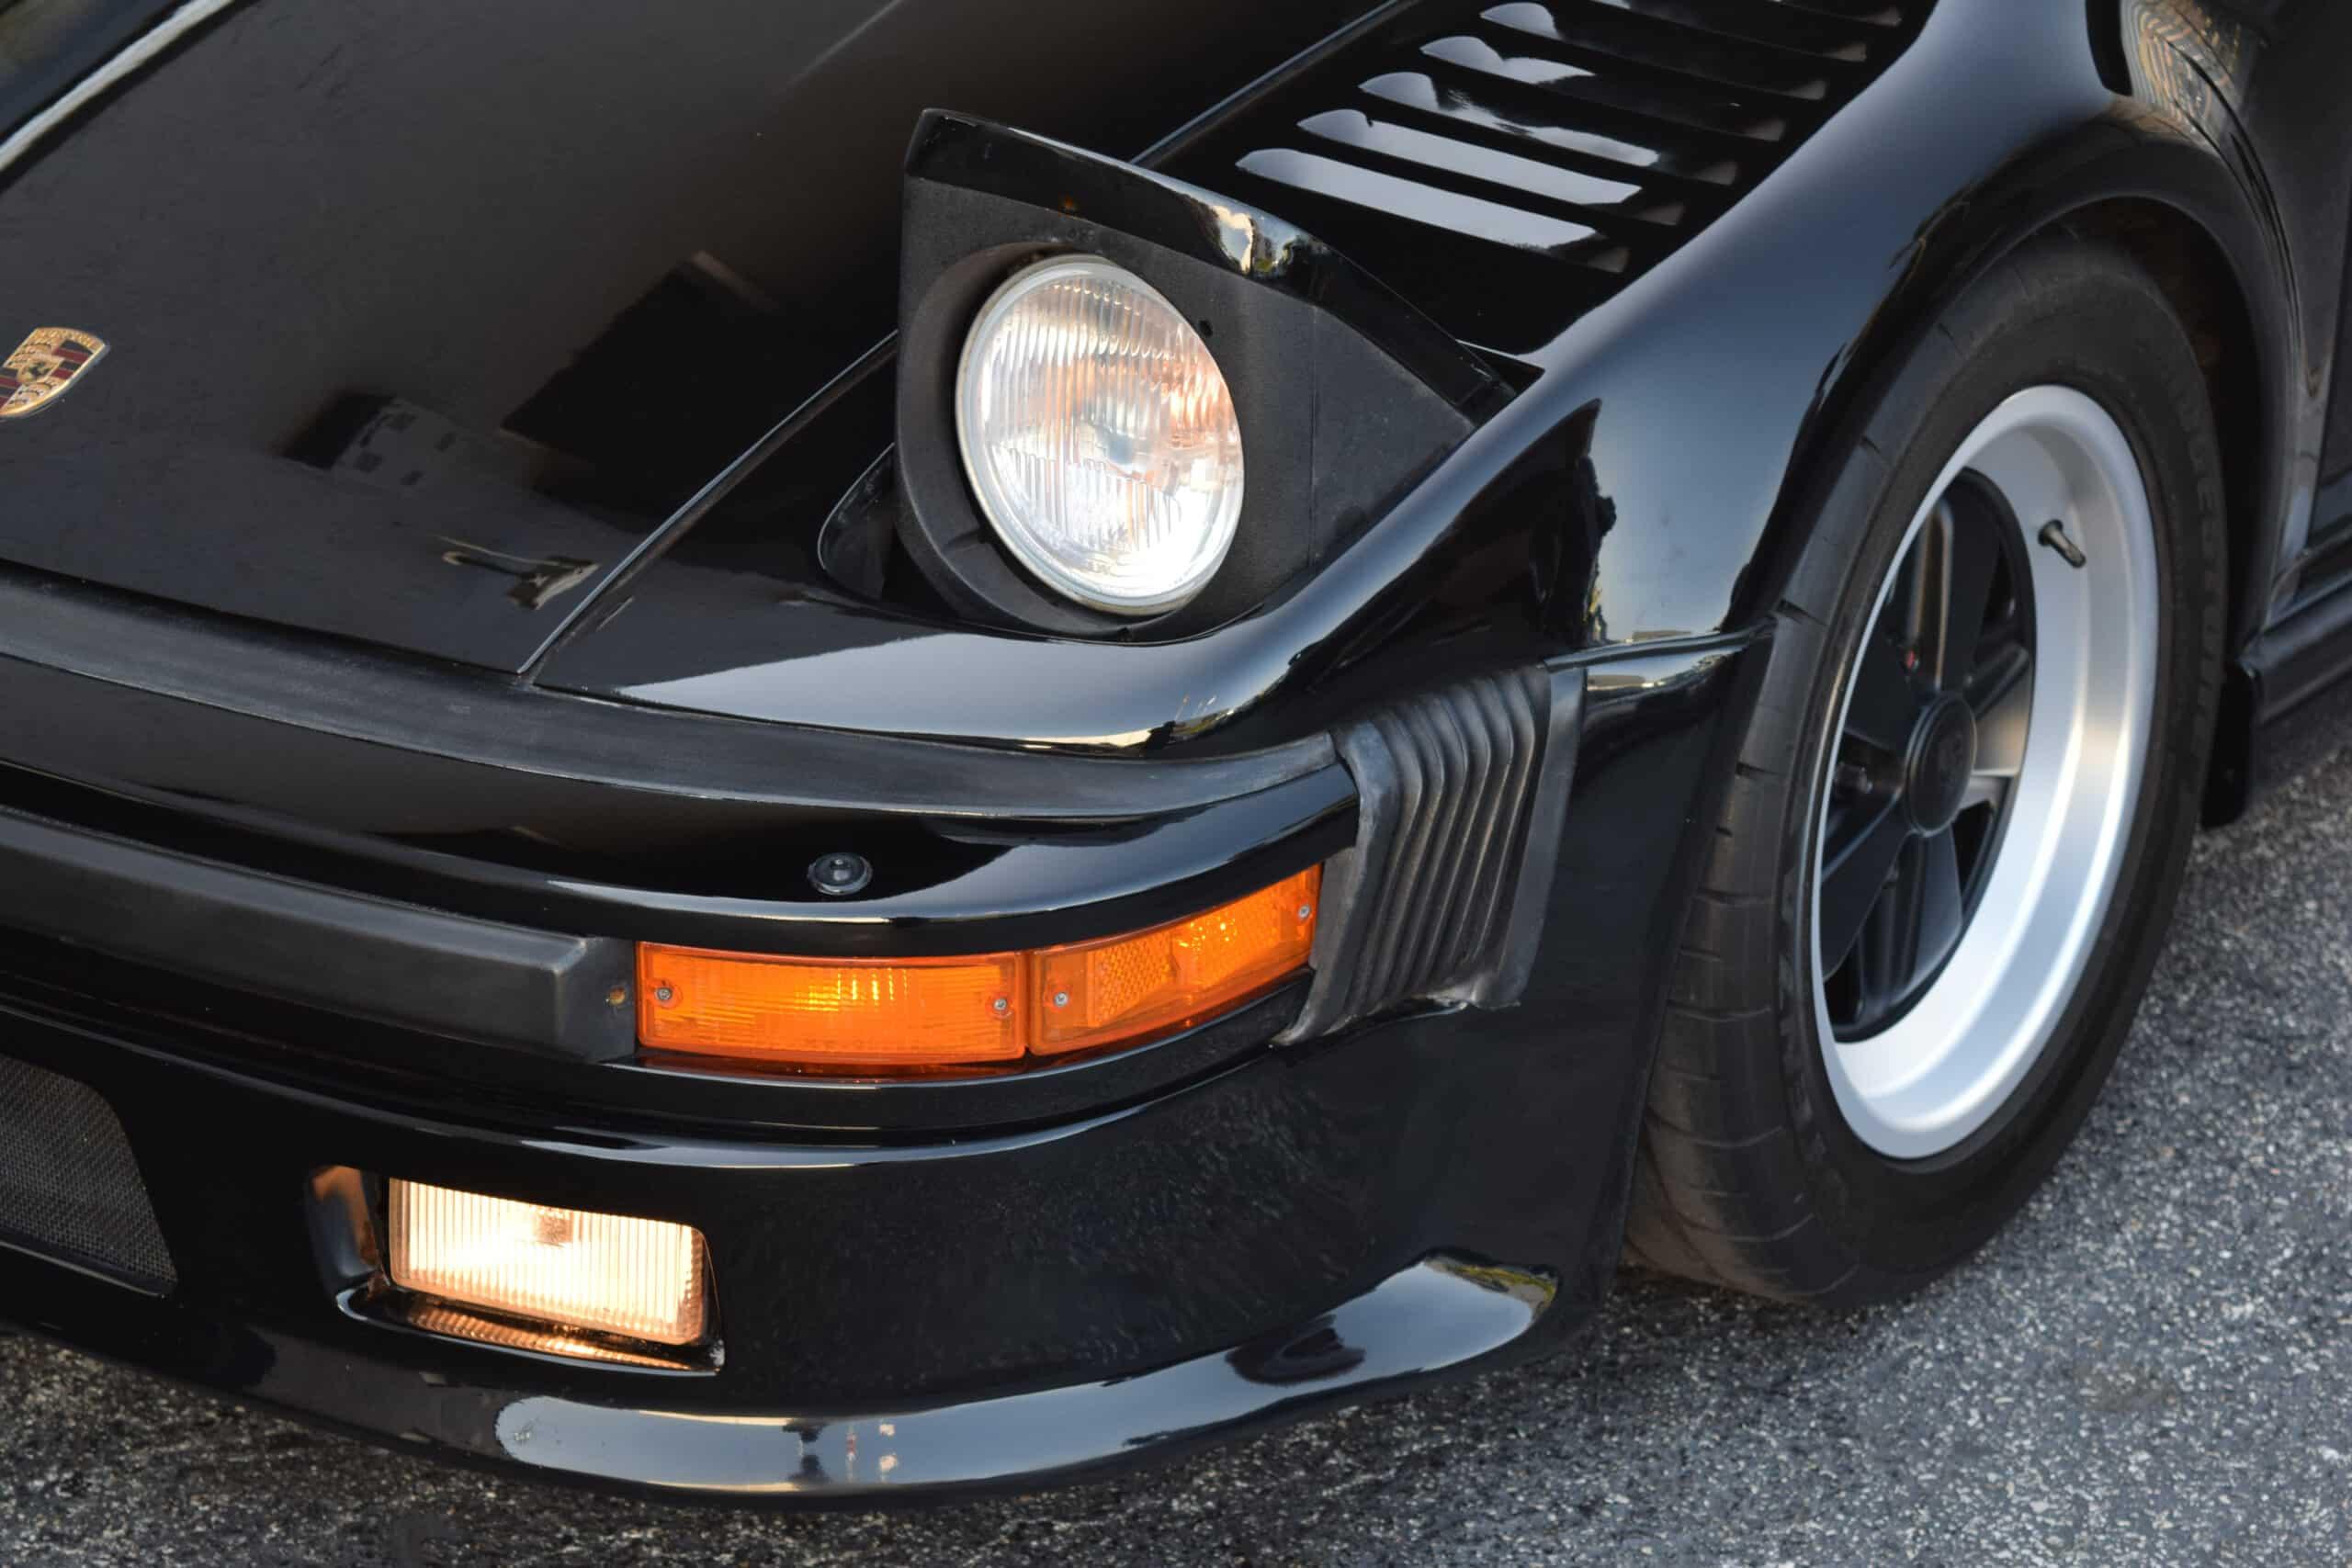 1987 Porsche 930 Turbo BlackburnDaly Slant Nose, 40K miles, Service history, books and stamps